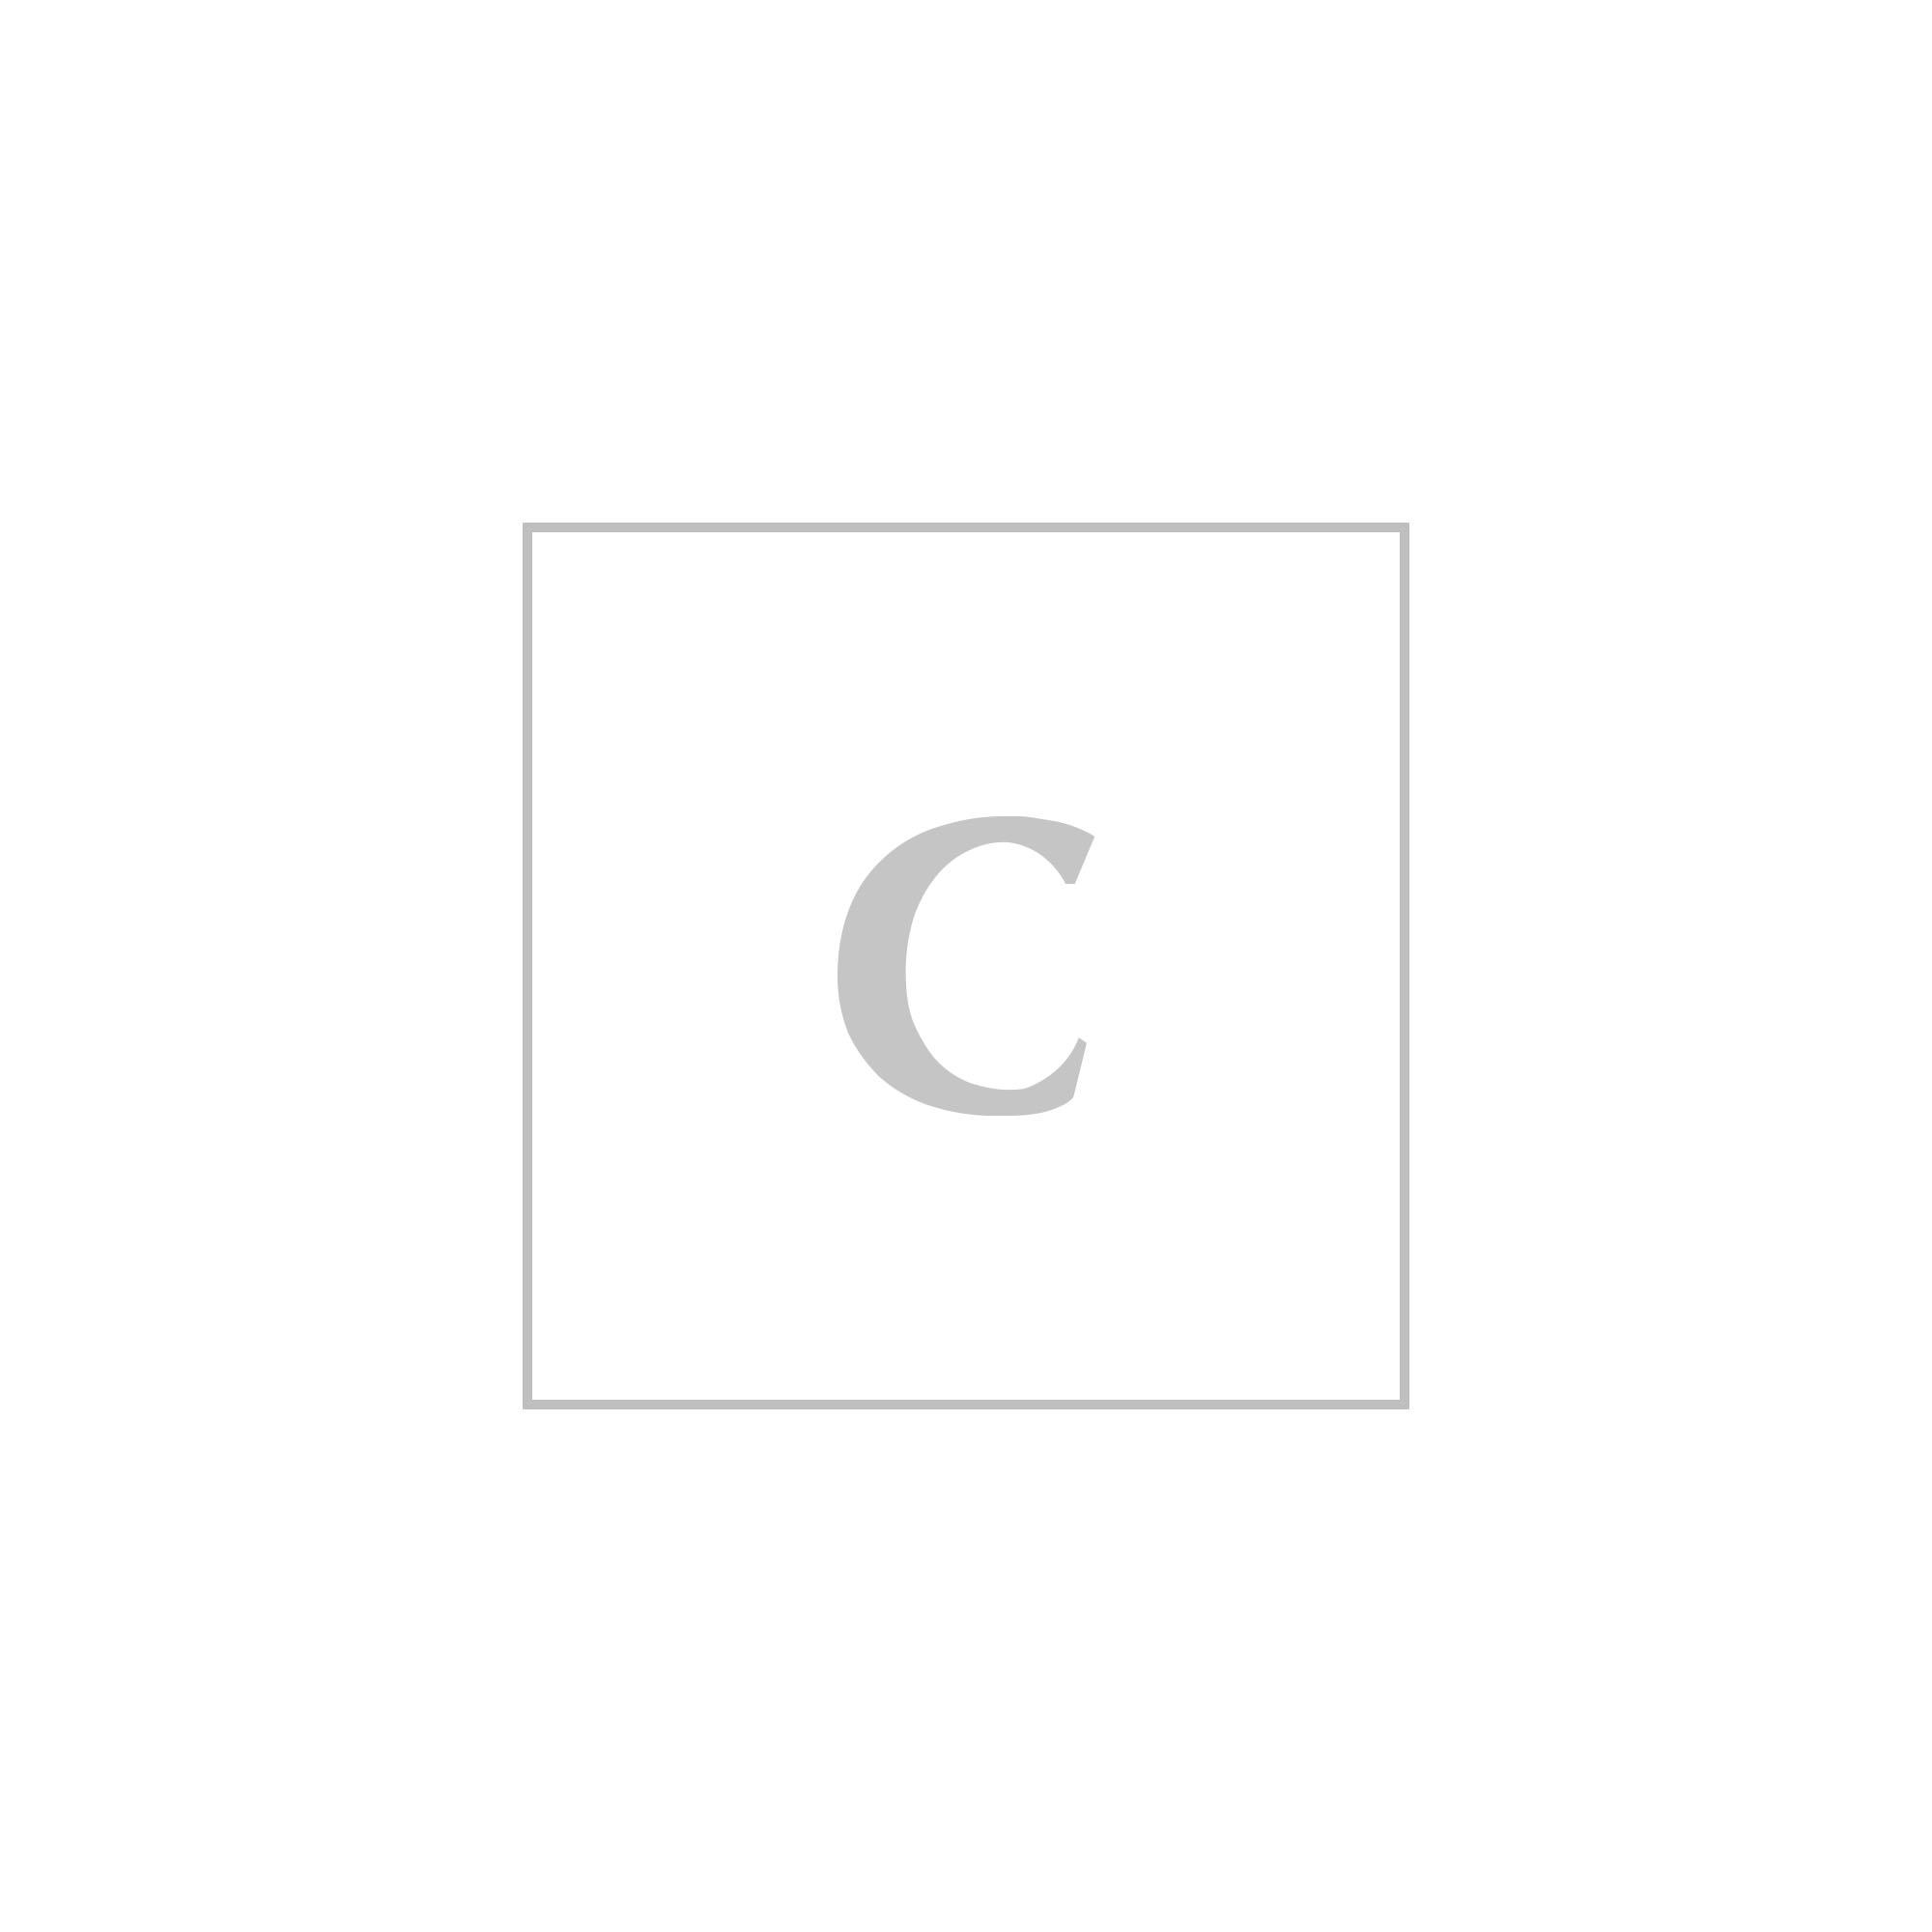 Dolce & gabbana lori 60 slingbacks